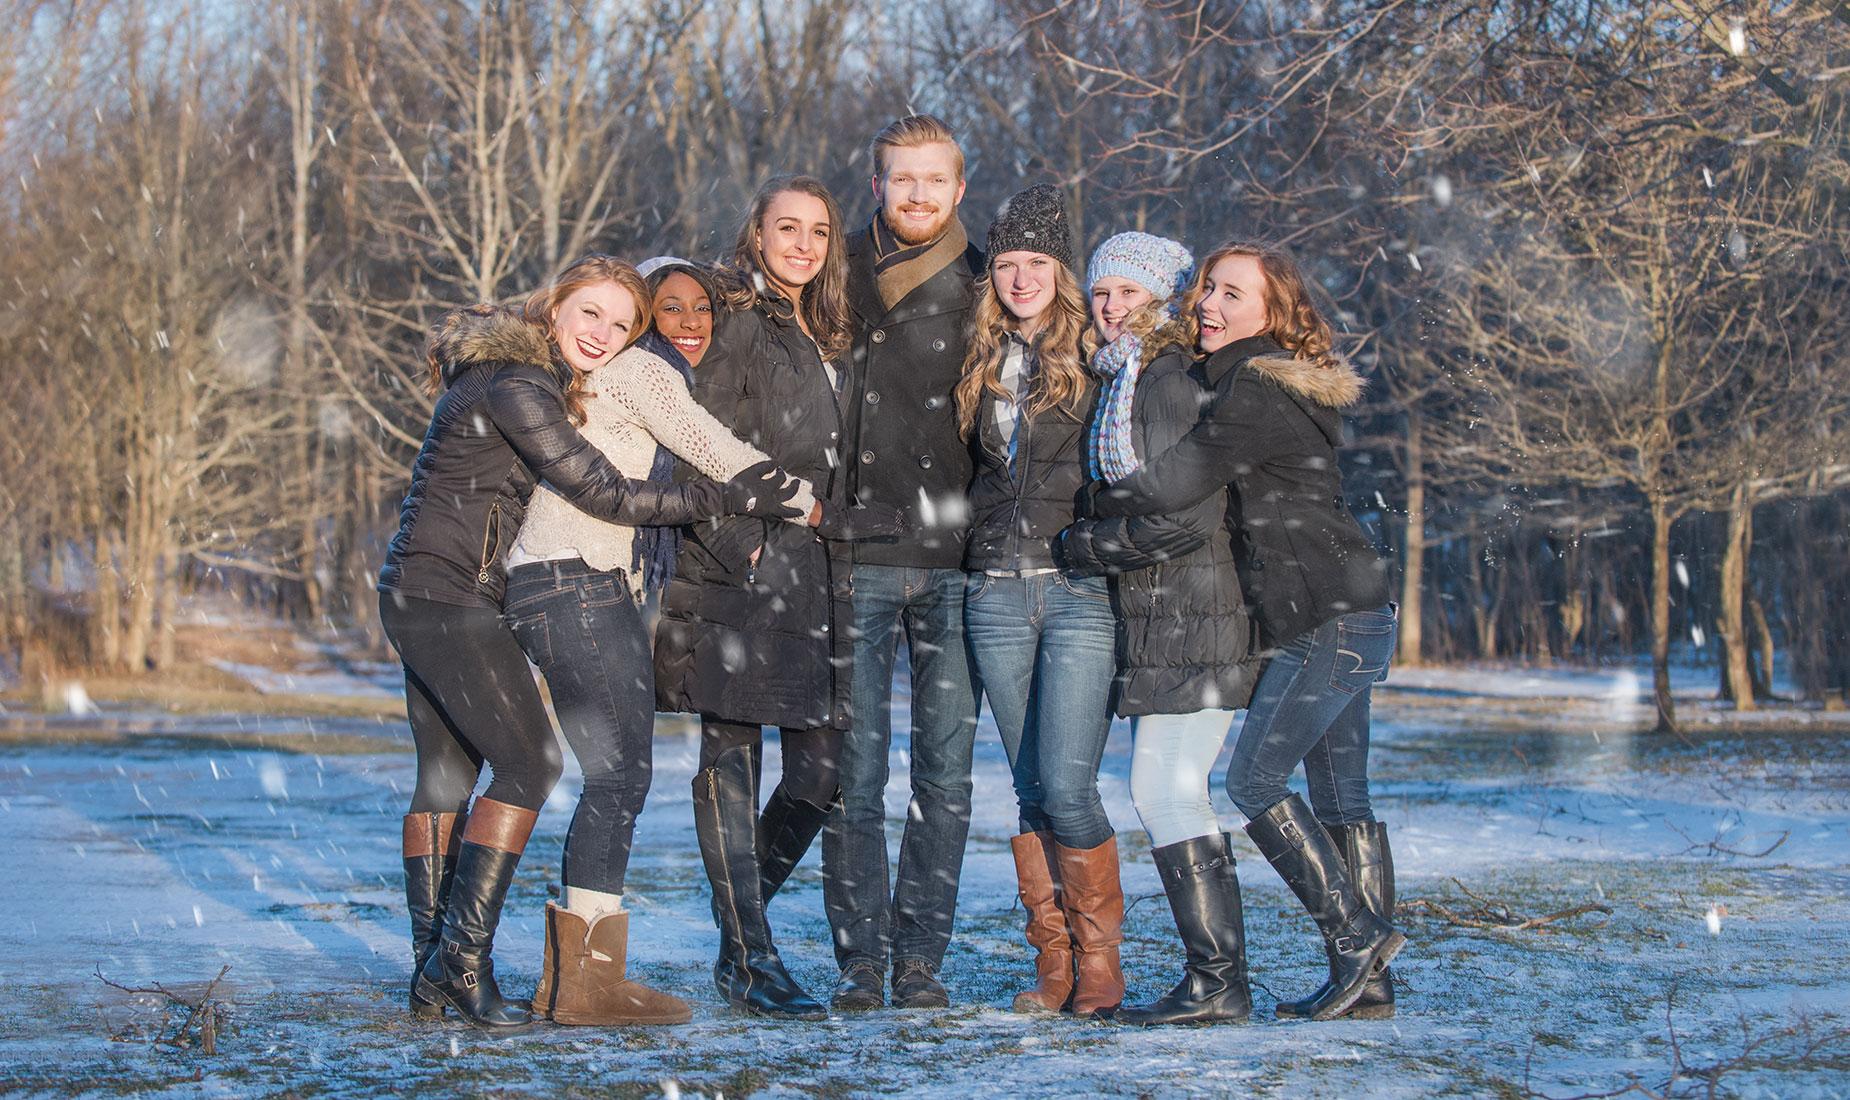 Eve Taverne Photography Senior Model Team 2018